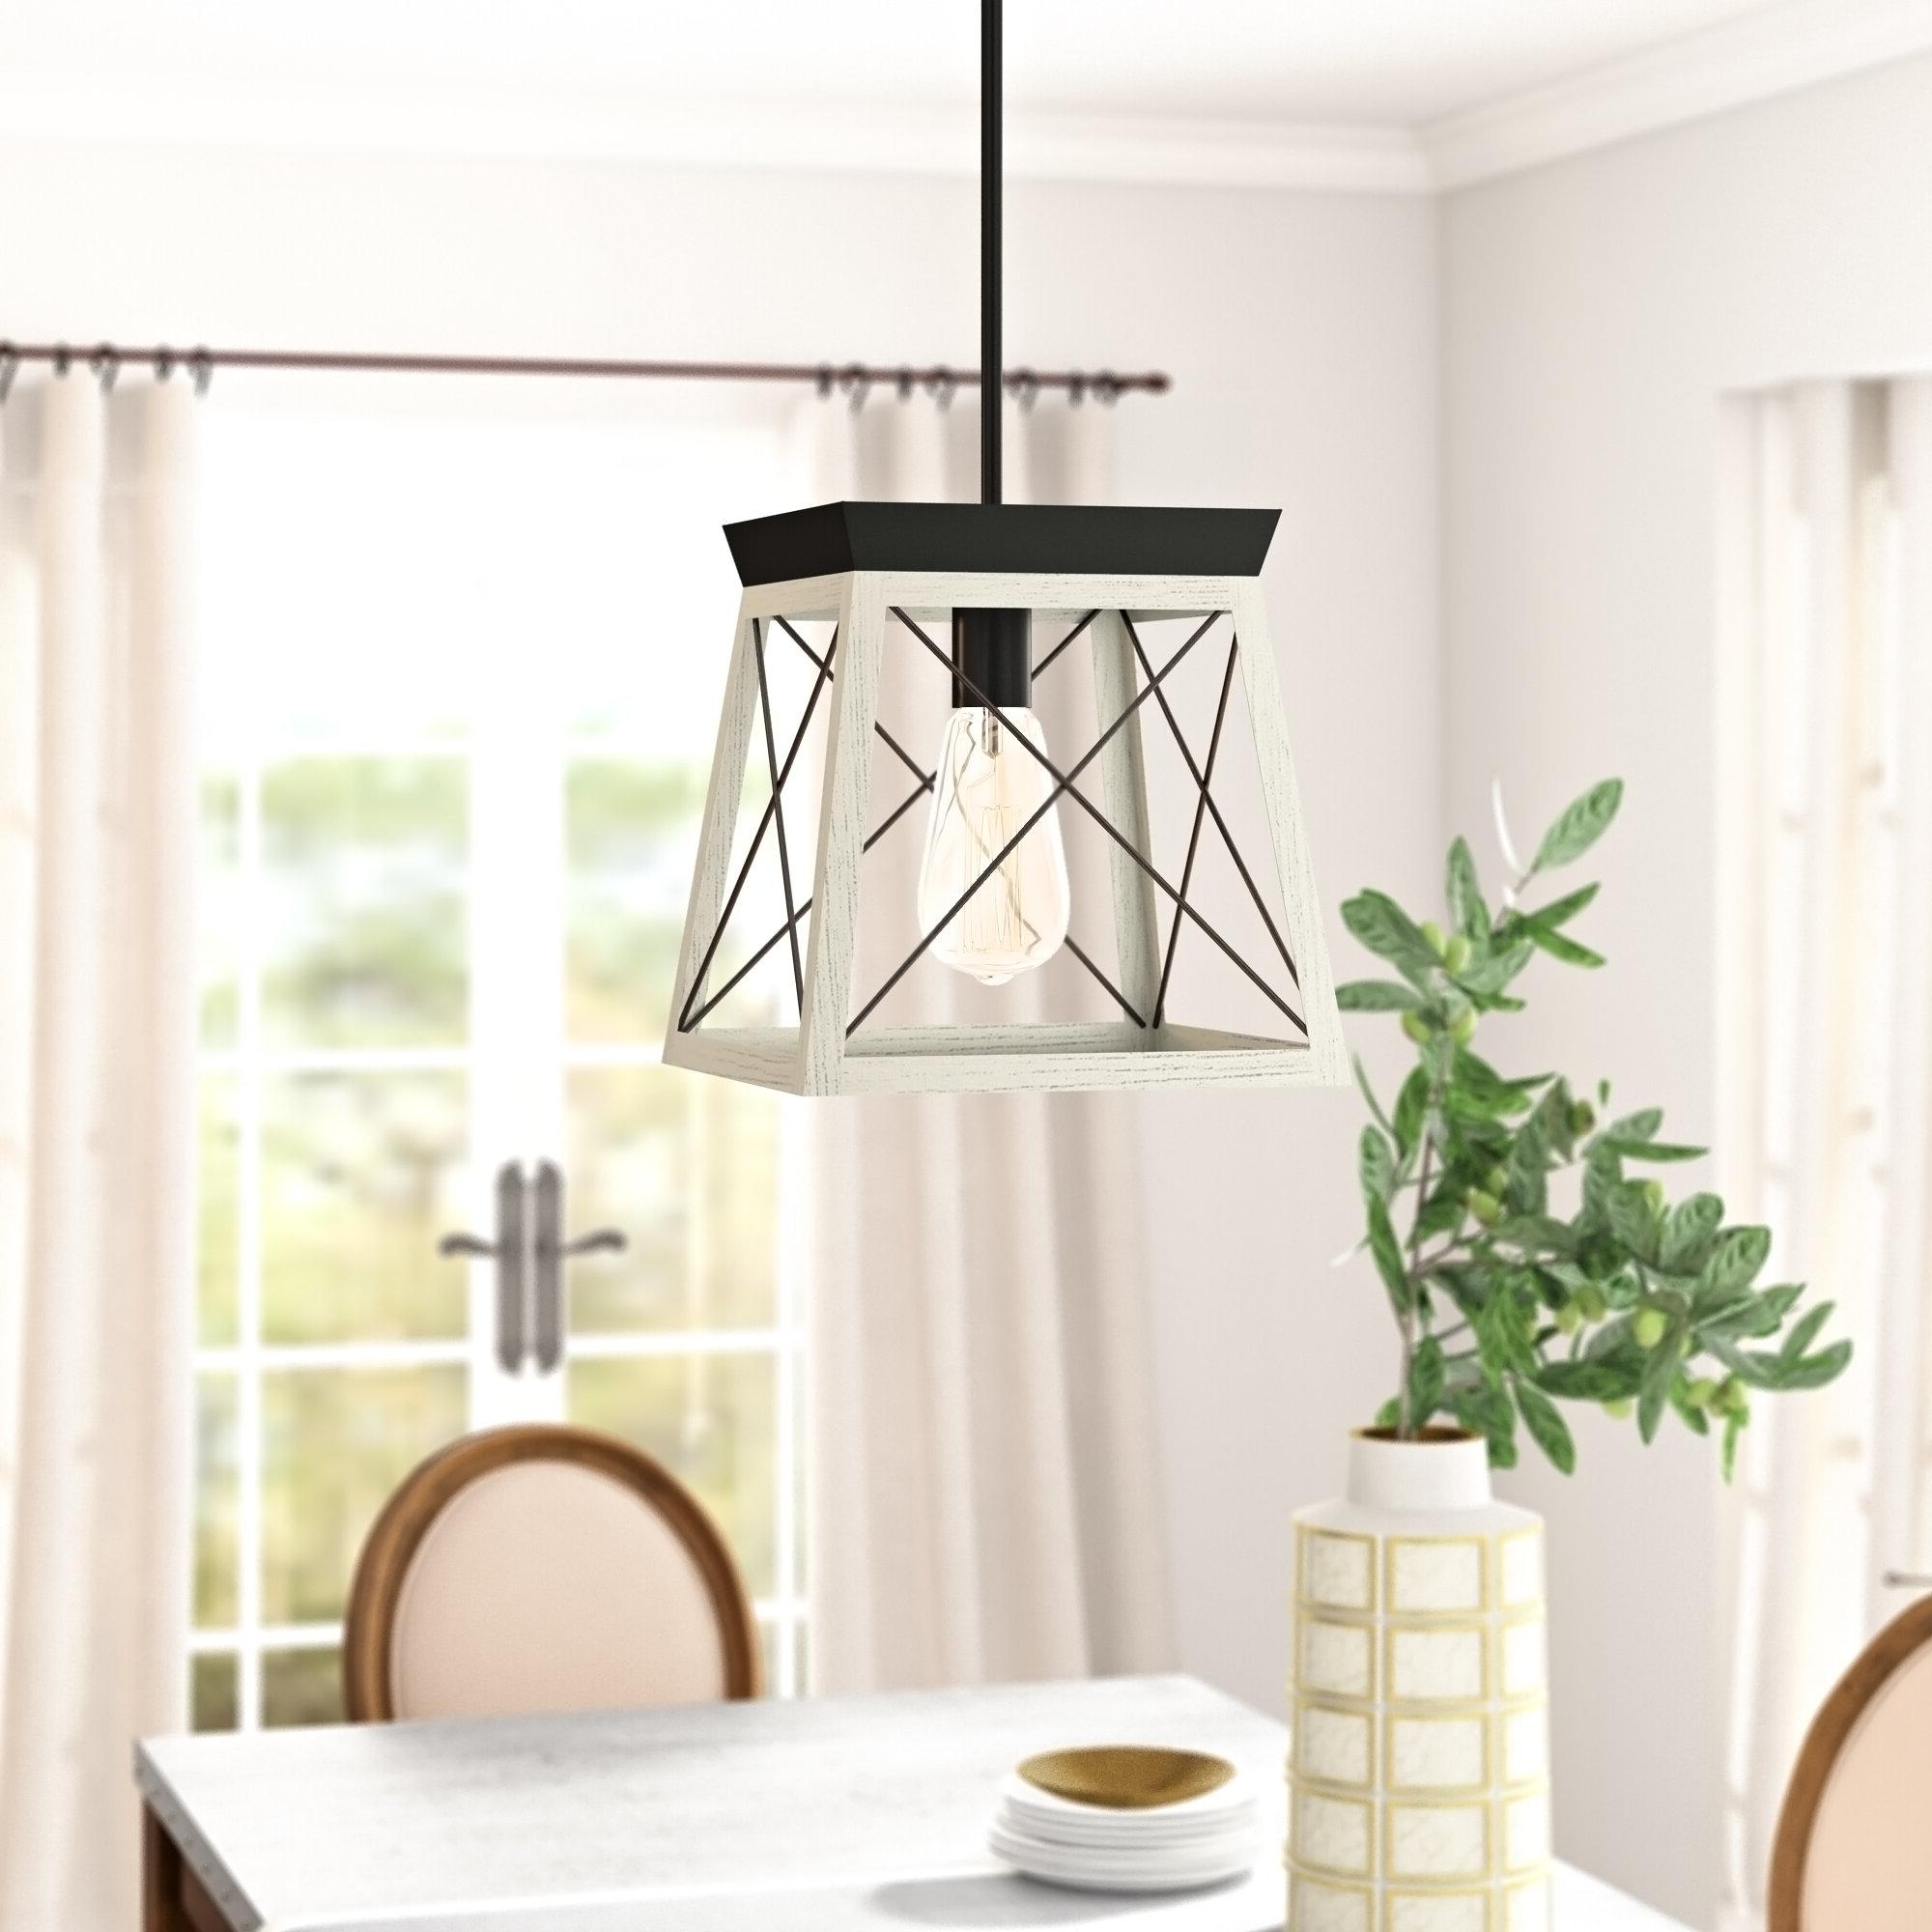 Best And Newest Delon 1 Light Lantern Geometric Pendant Regarding Delon 1 Light Lantern Geometric Pendants (View 2 of 25)